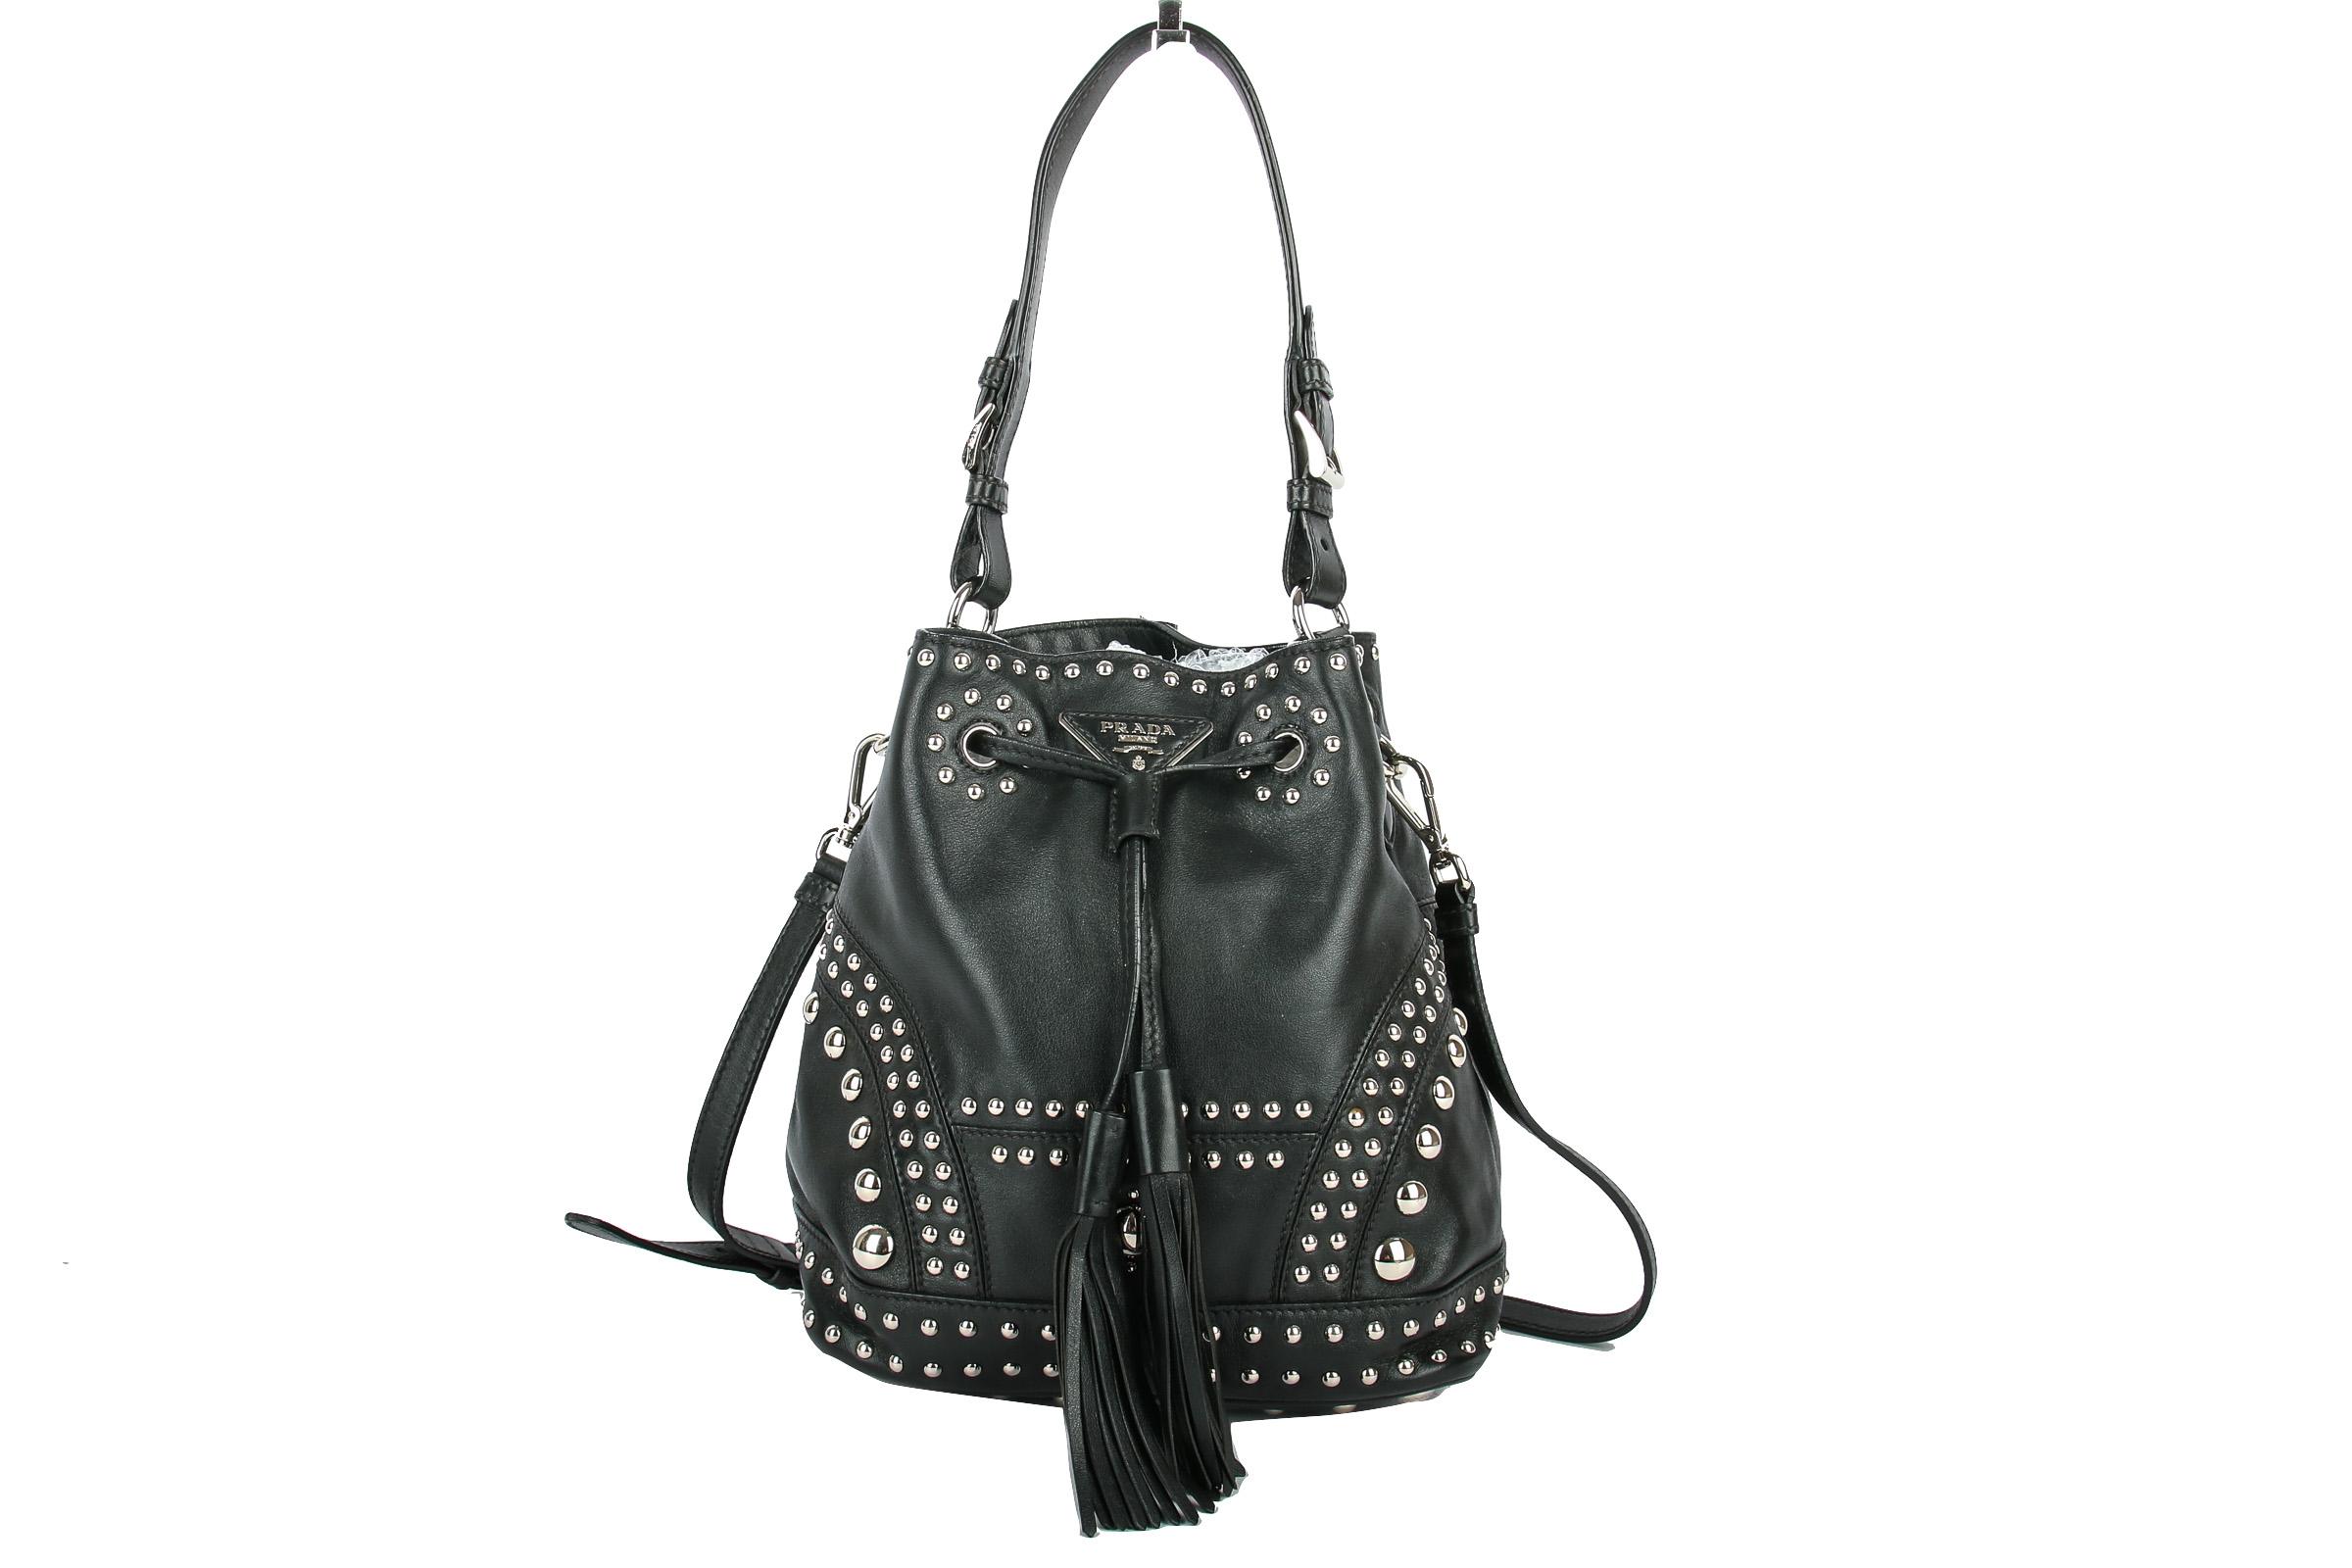 ba4f47a7f20b Prada Handbags   Accessories